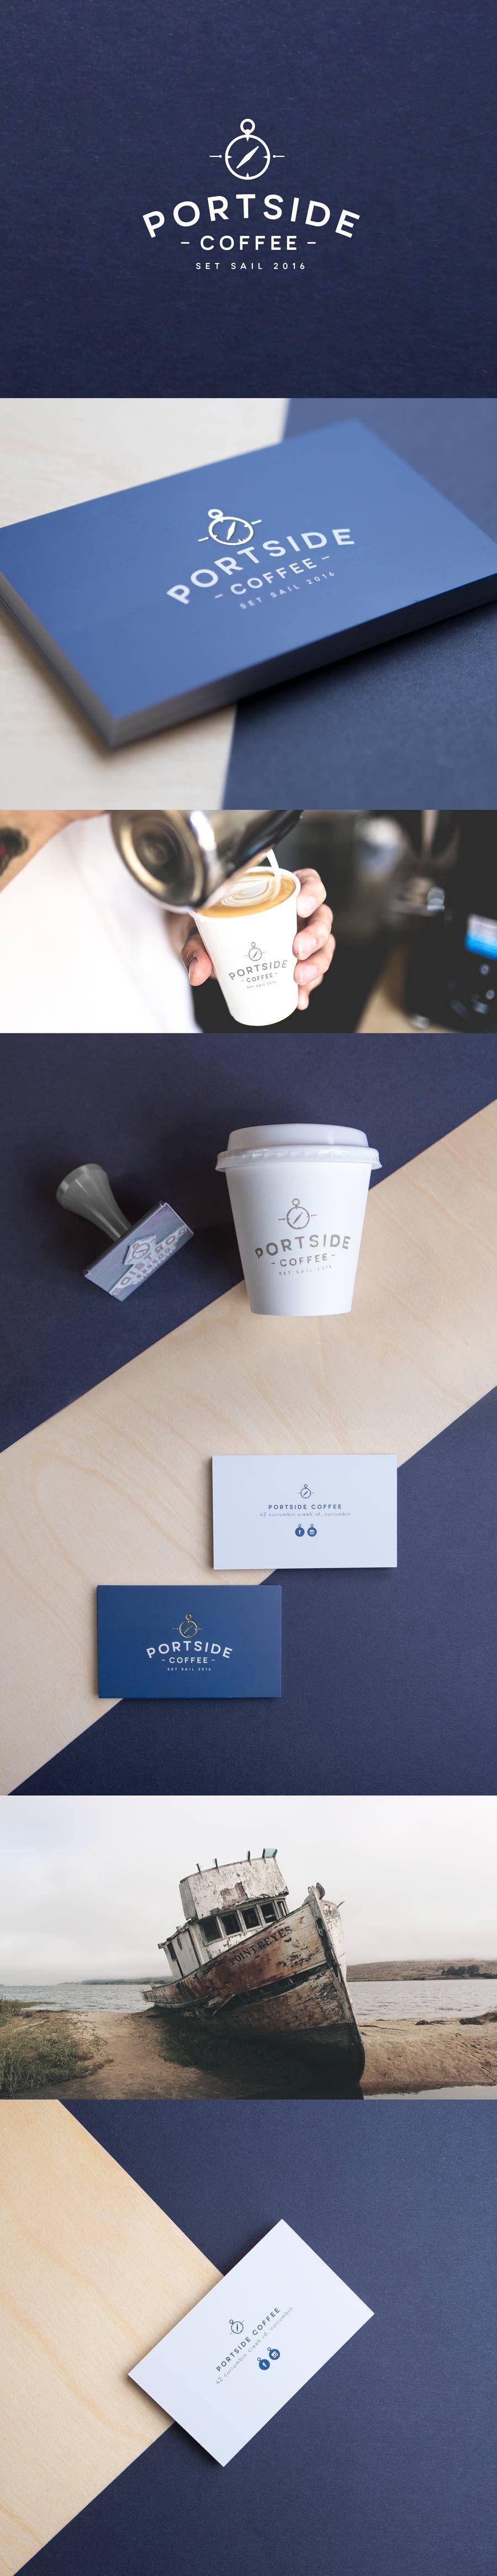 Portside Coffee – Currumbin, Gold Coast. Cafe Coffee - Logo ...